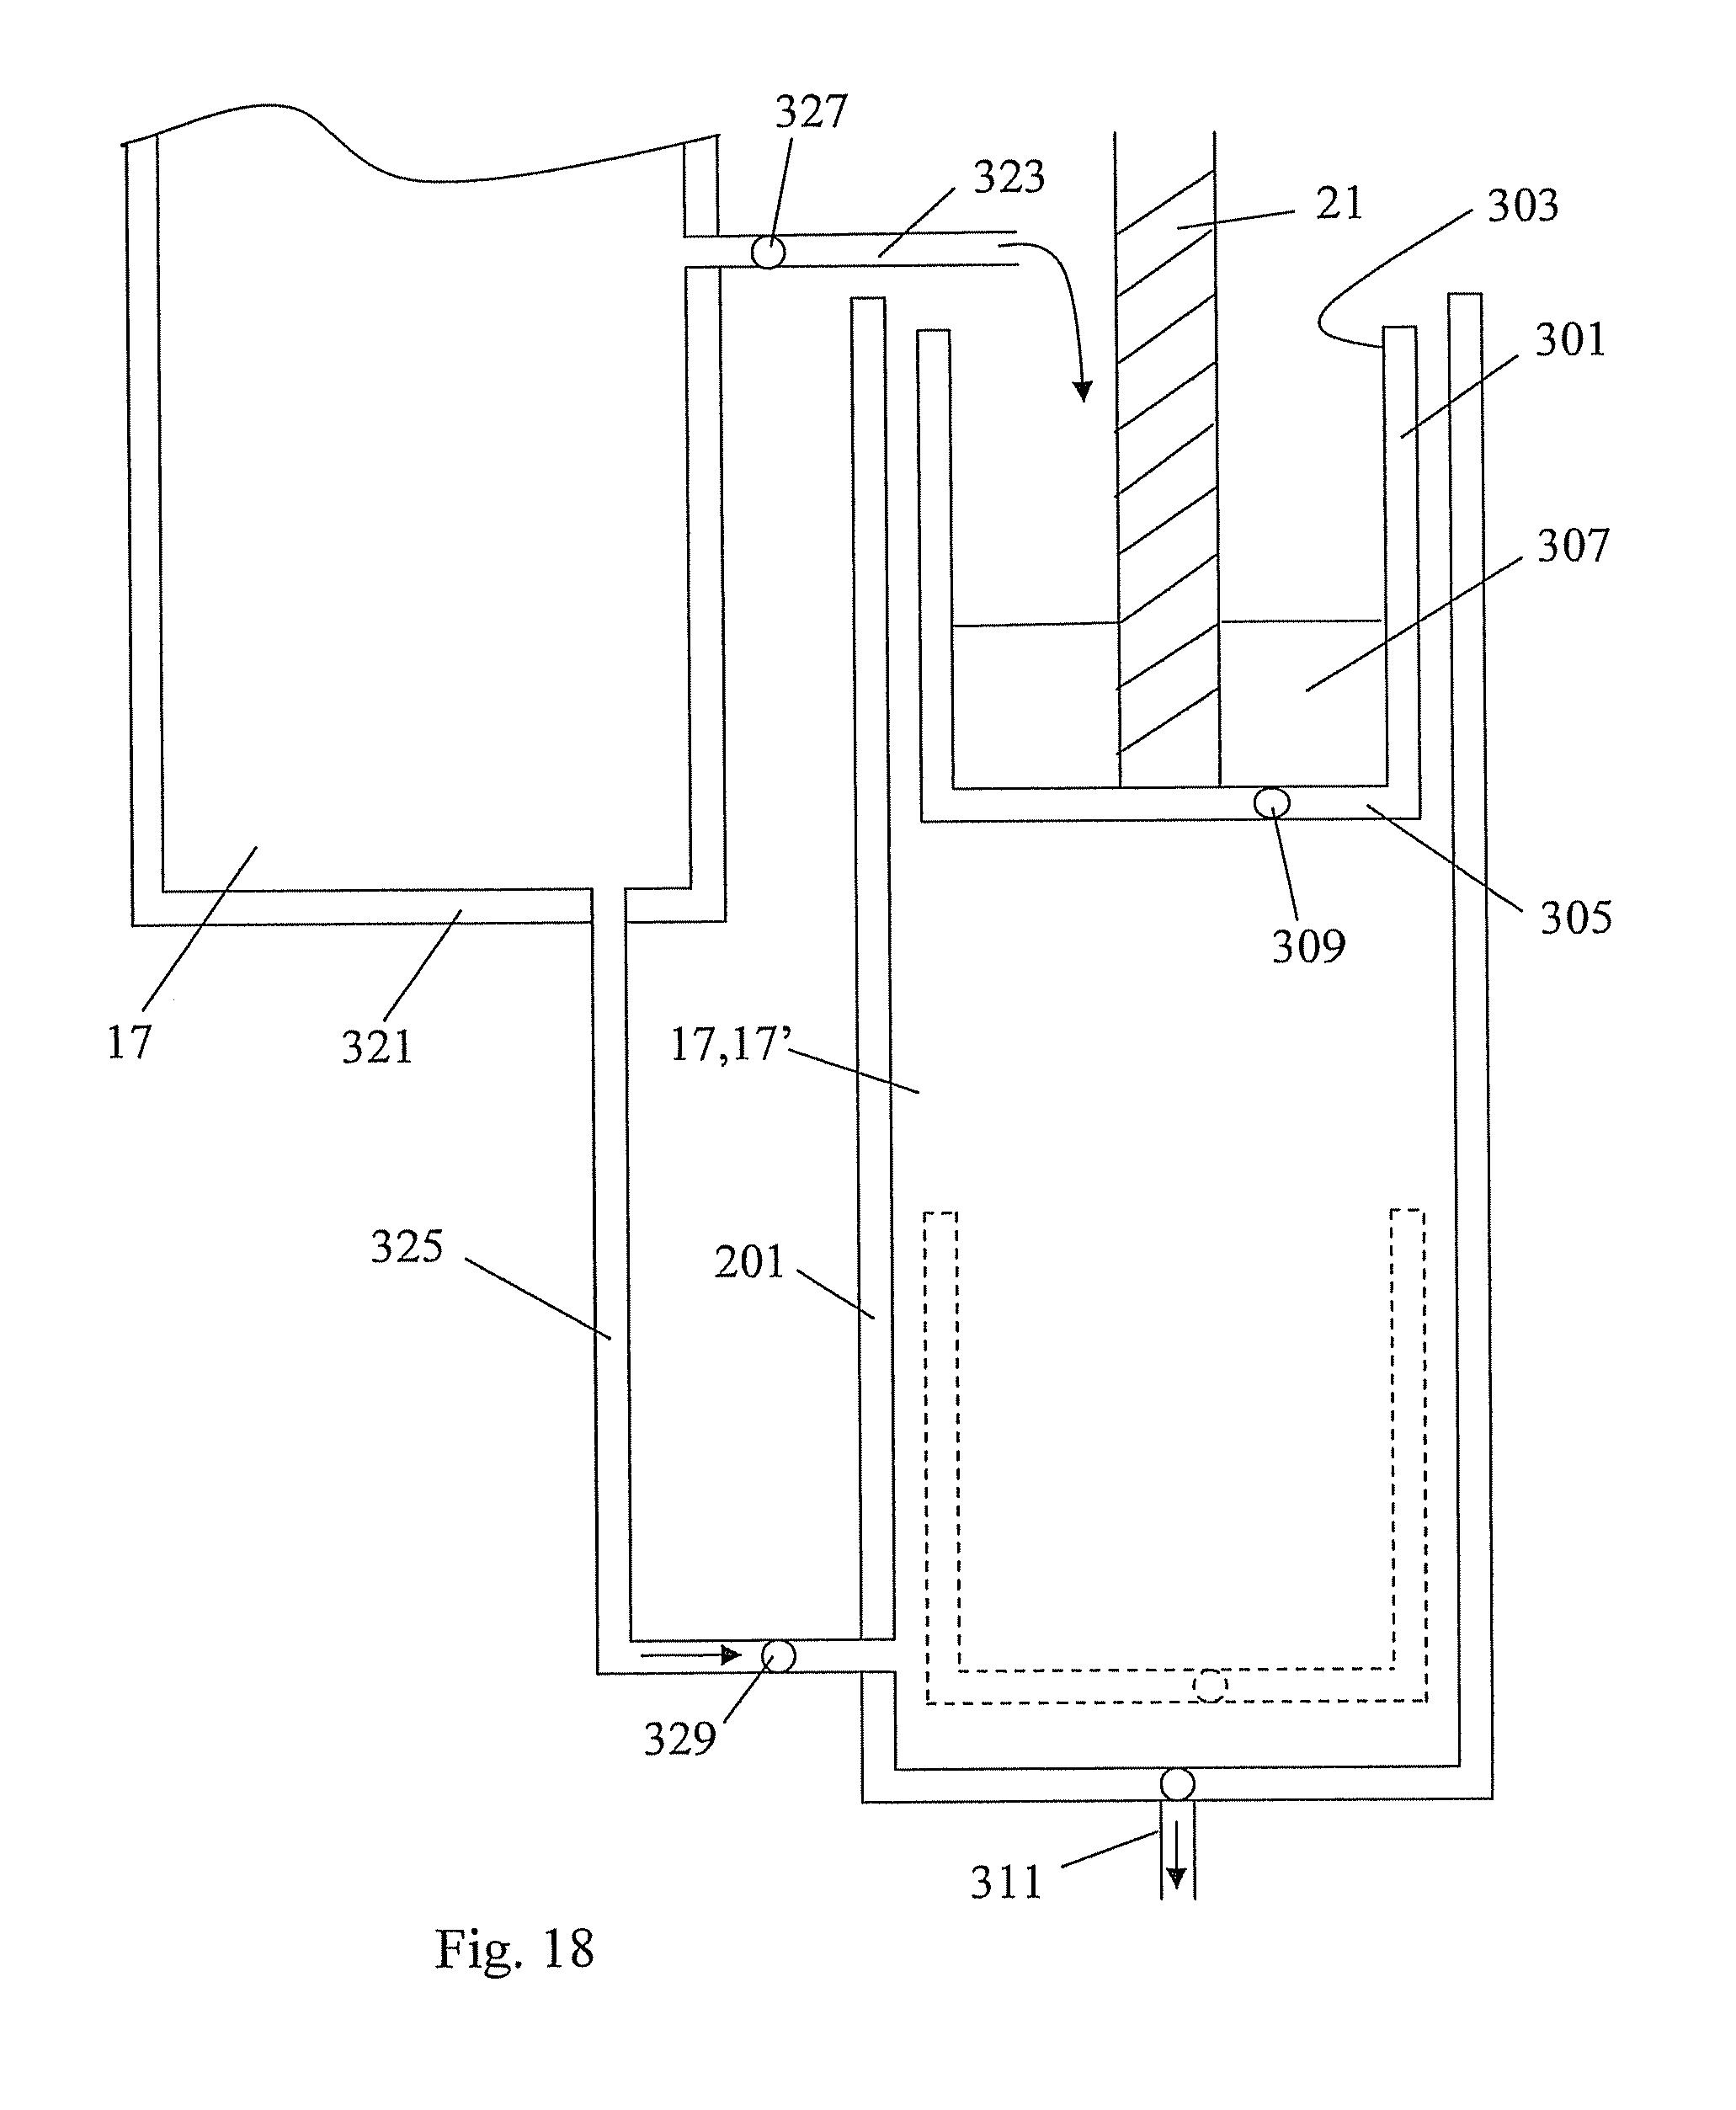 Wiring Diagram Likewise High Pressure Sodium Ballast Wiring Diagram